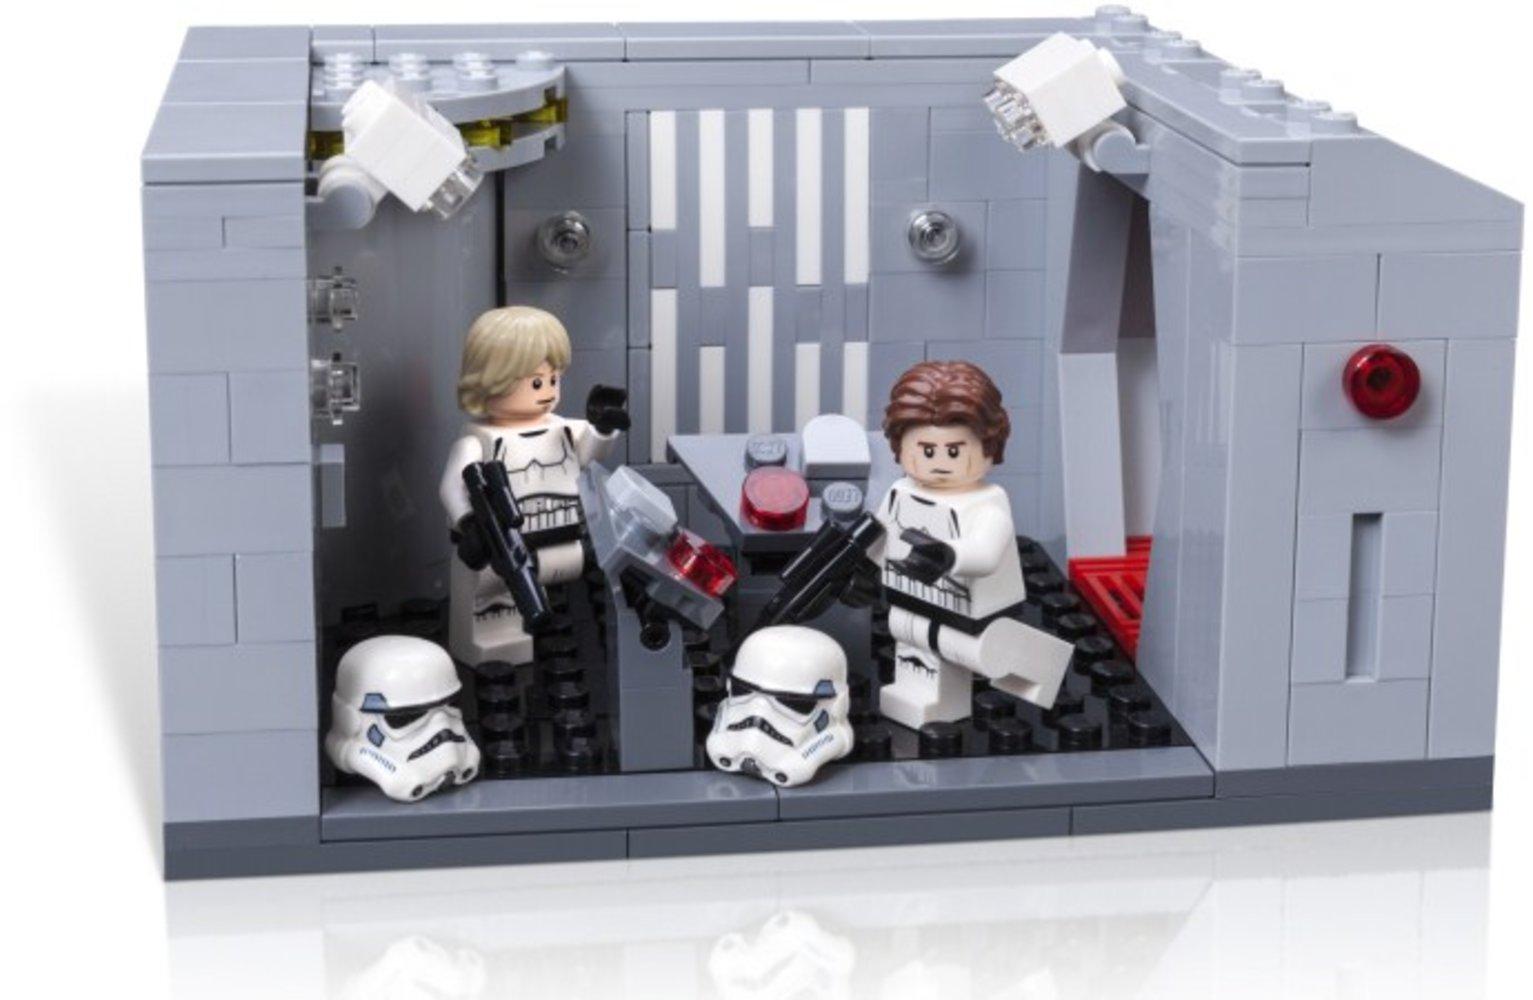 Detention Block Rescue (Star Wars Celebration 2017 Exclusive Set)